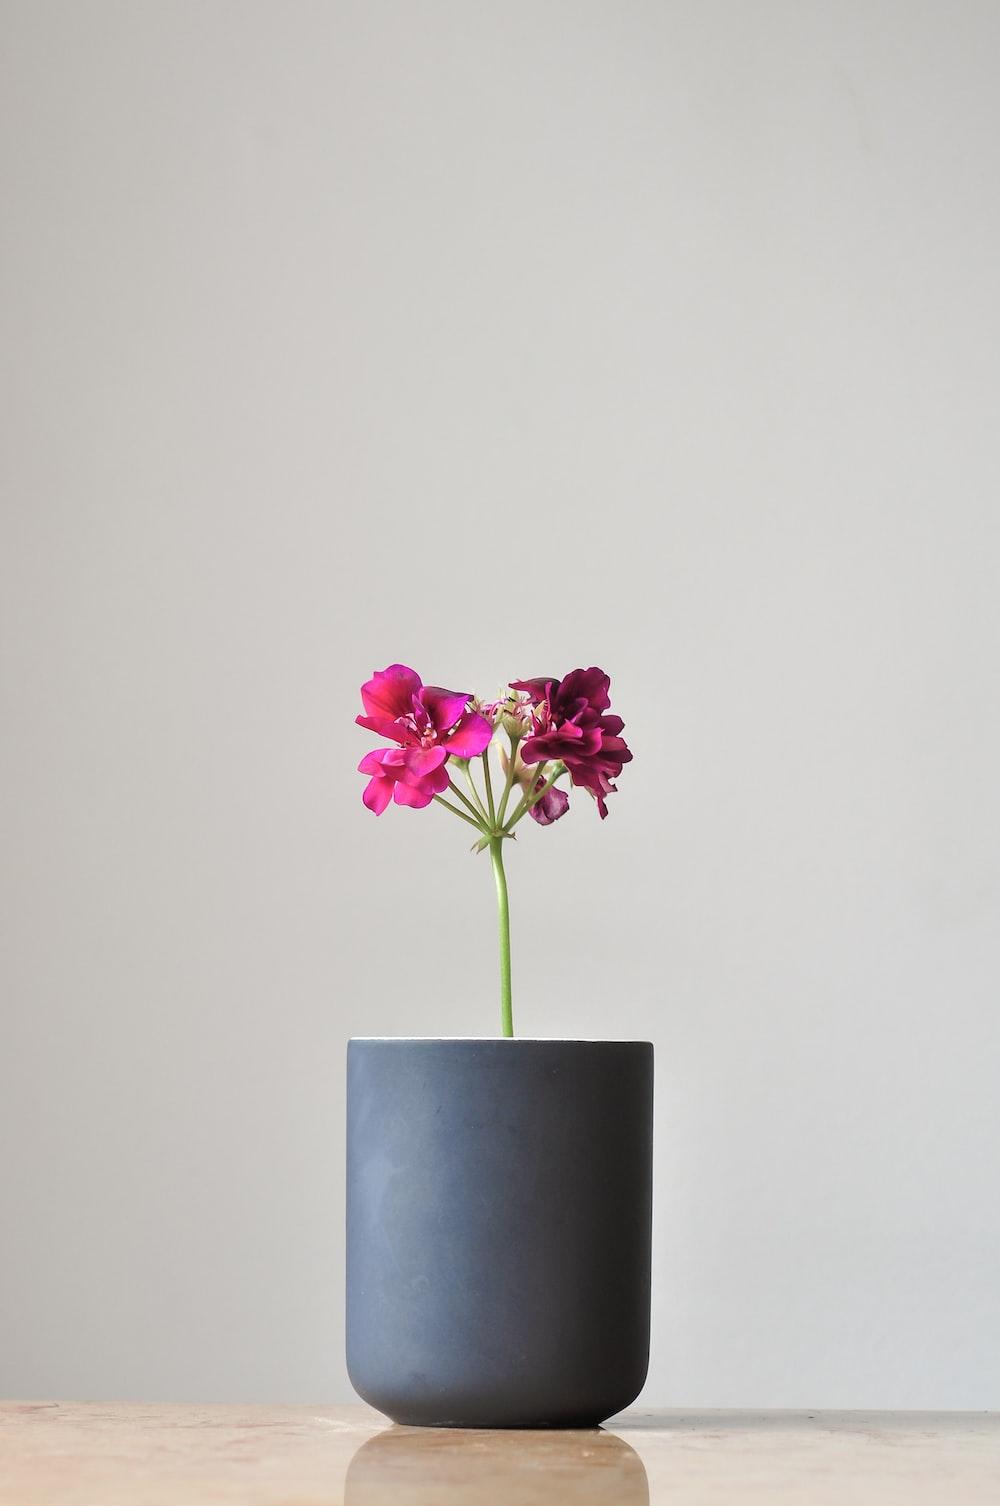 purple-petaled flower in gray vase